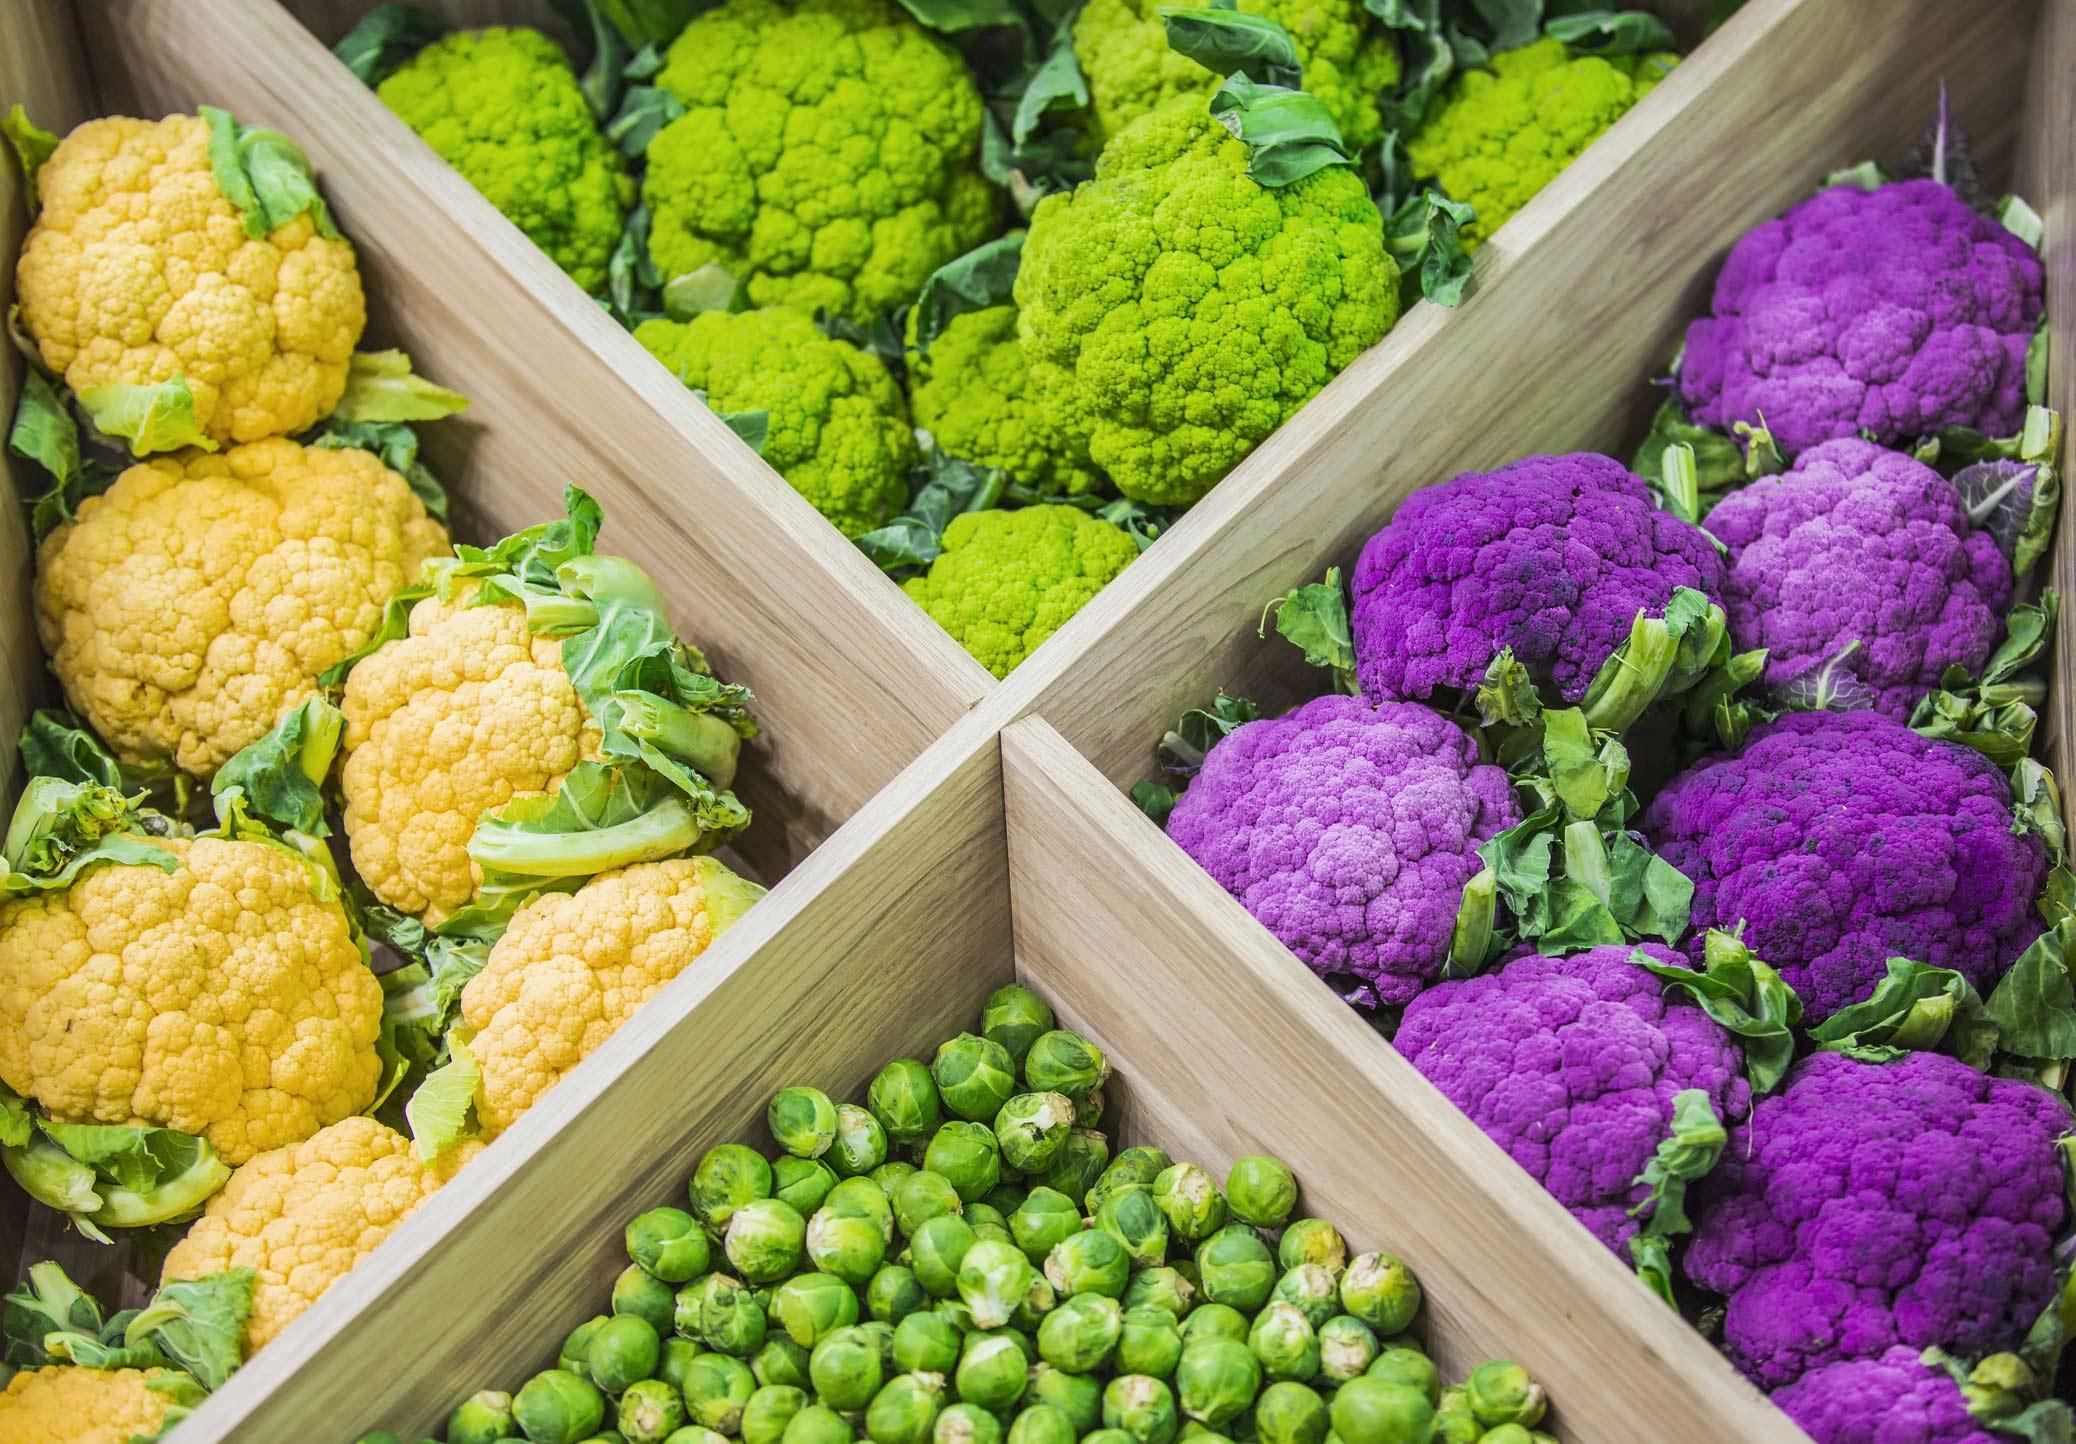 Colorful cruciferous vegetables